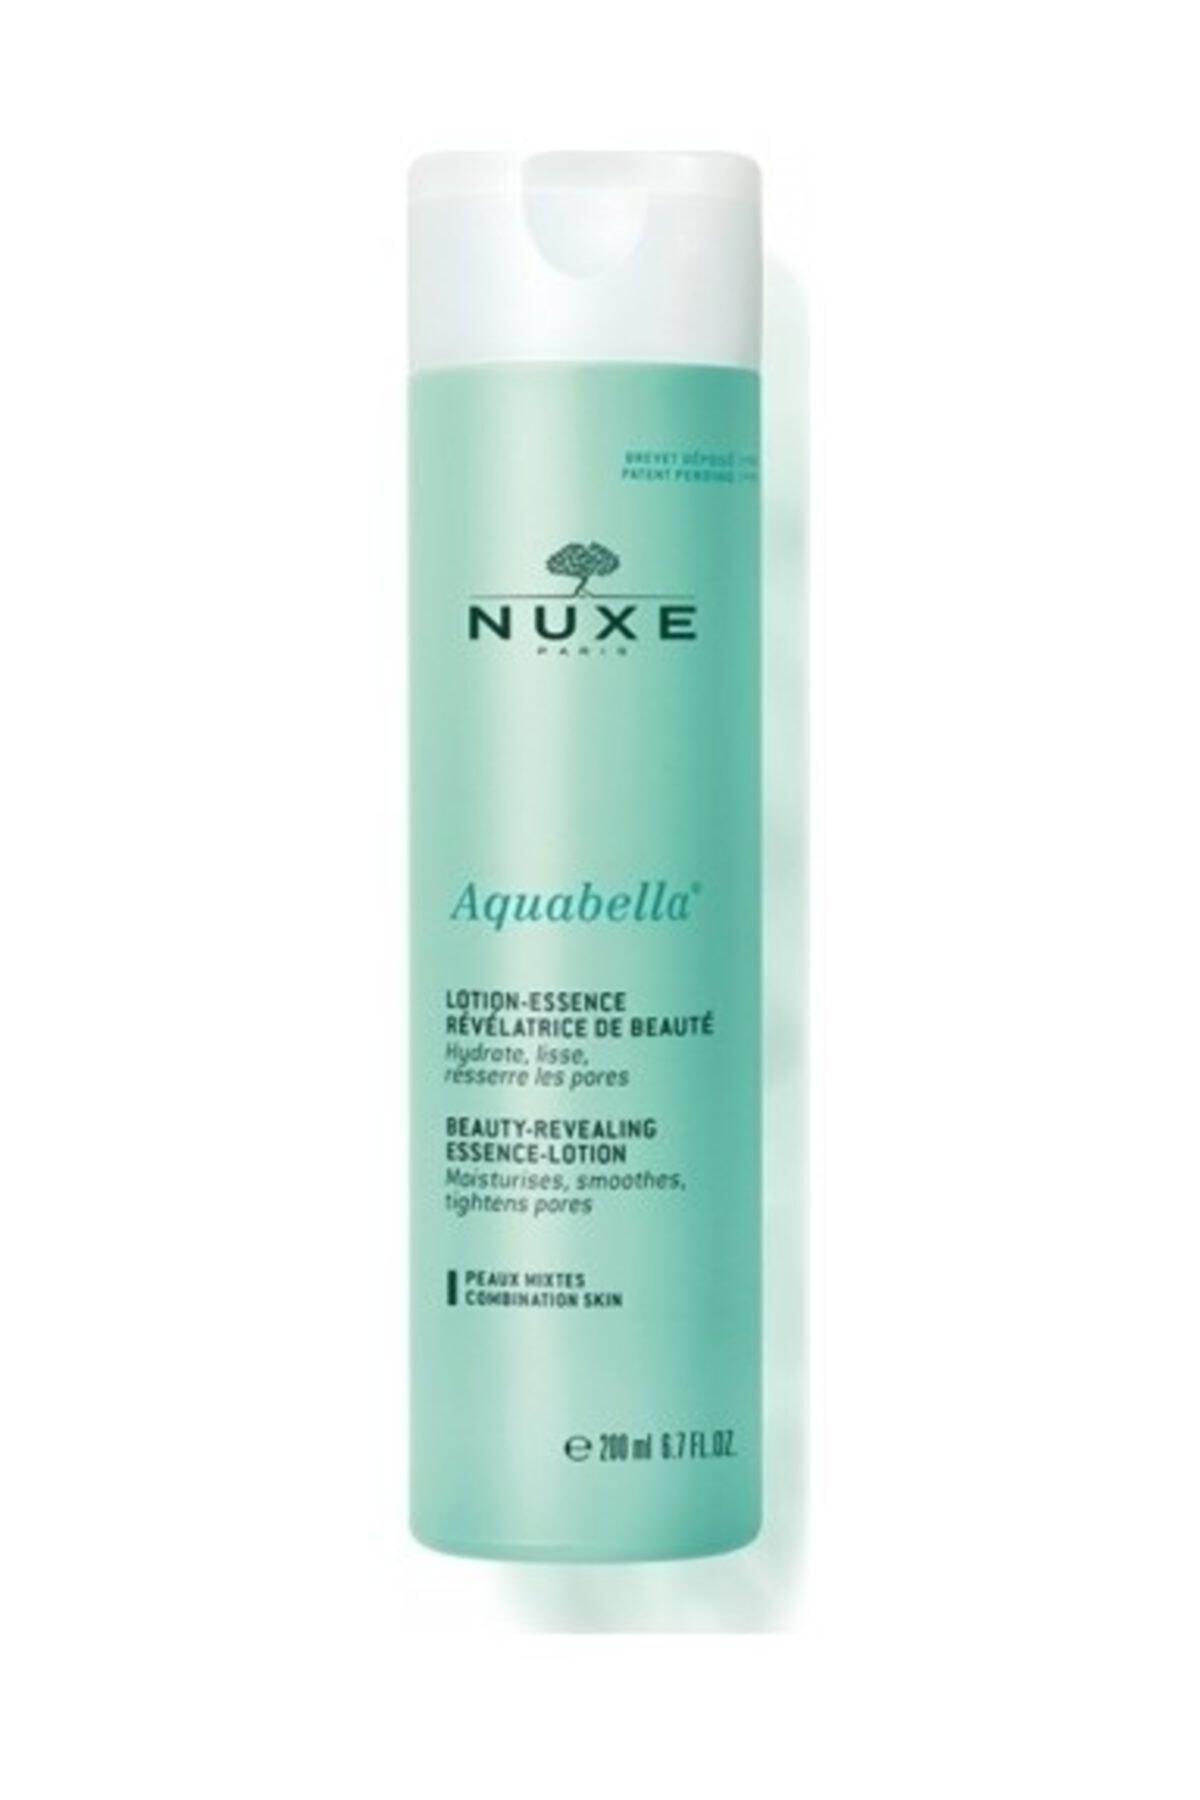 Nuxe Aquabella Beauty Revealing Essence Lotion 200 ml 2